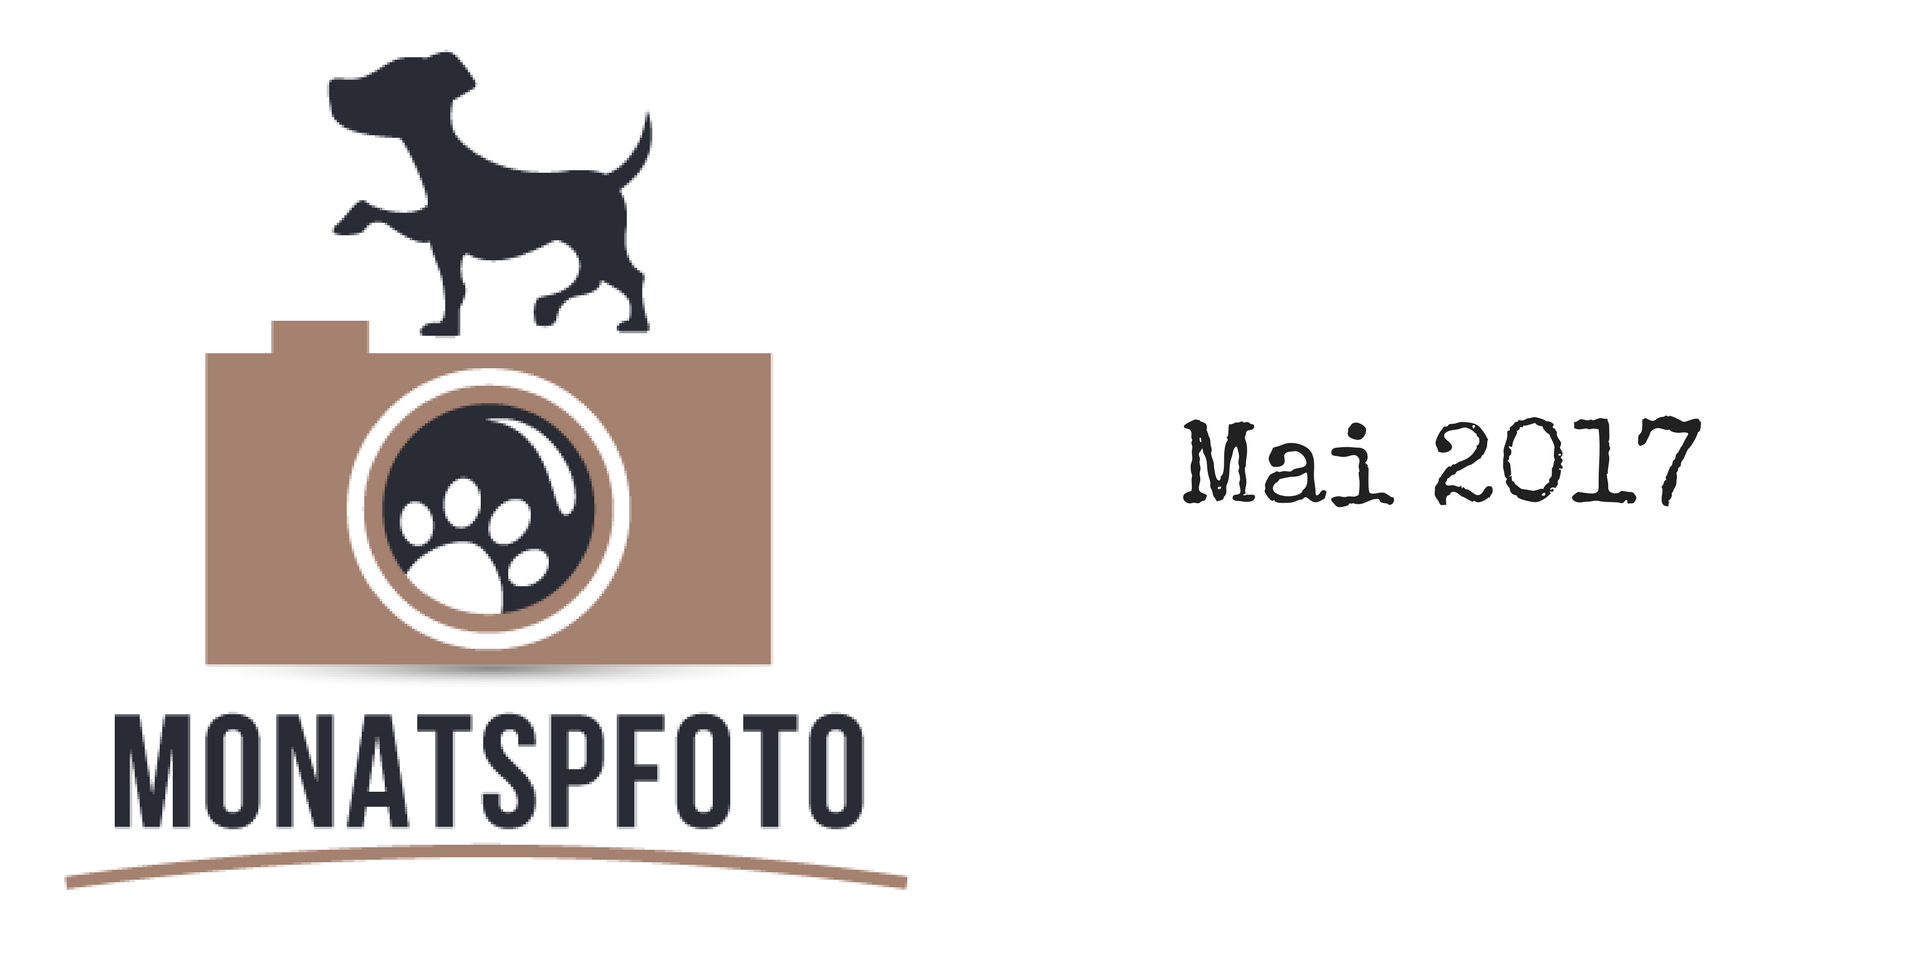 Monatspfoto Mai 2017 miDoggy Blog Community für Hunde